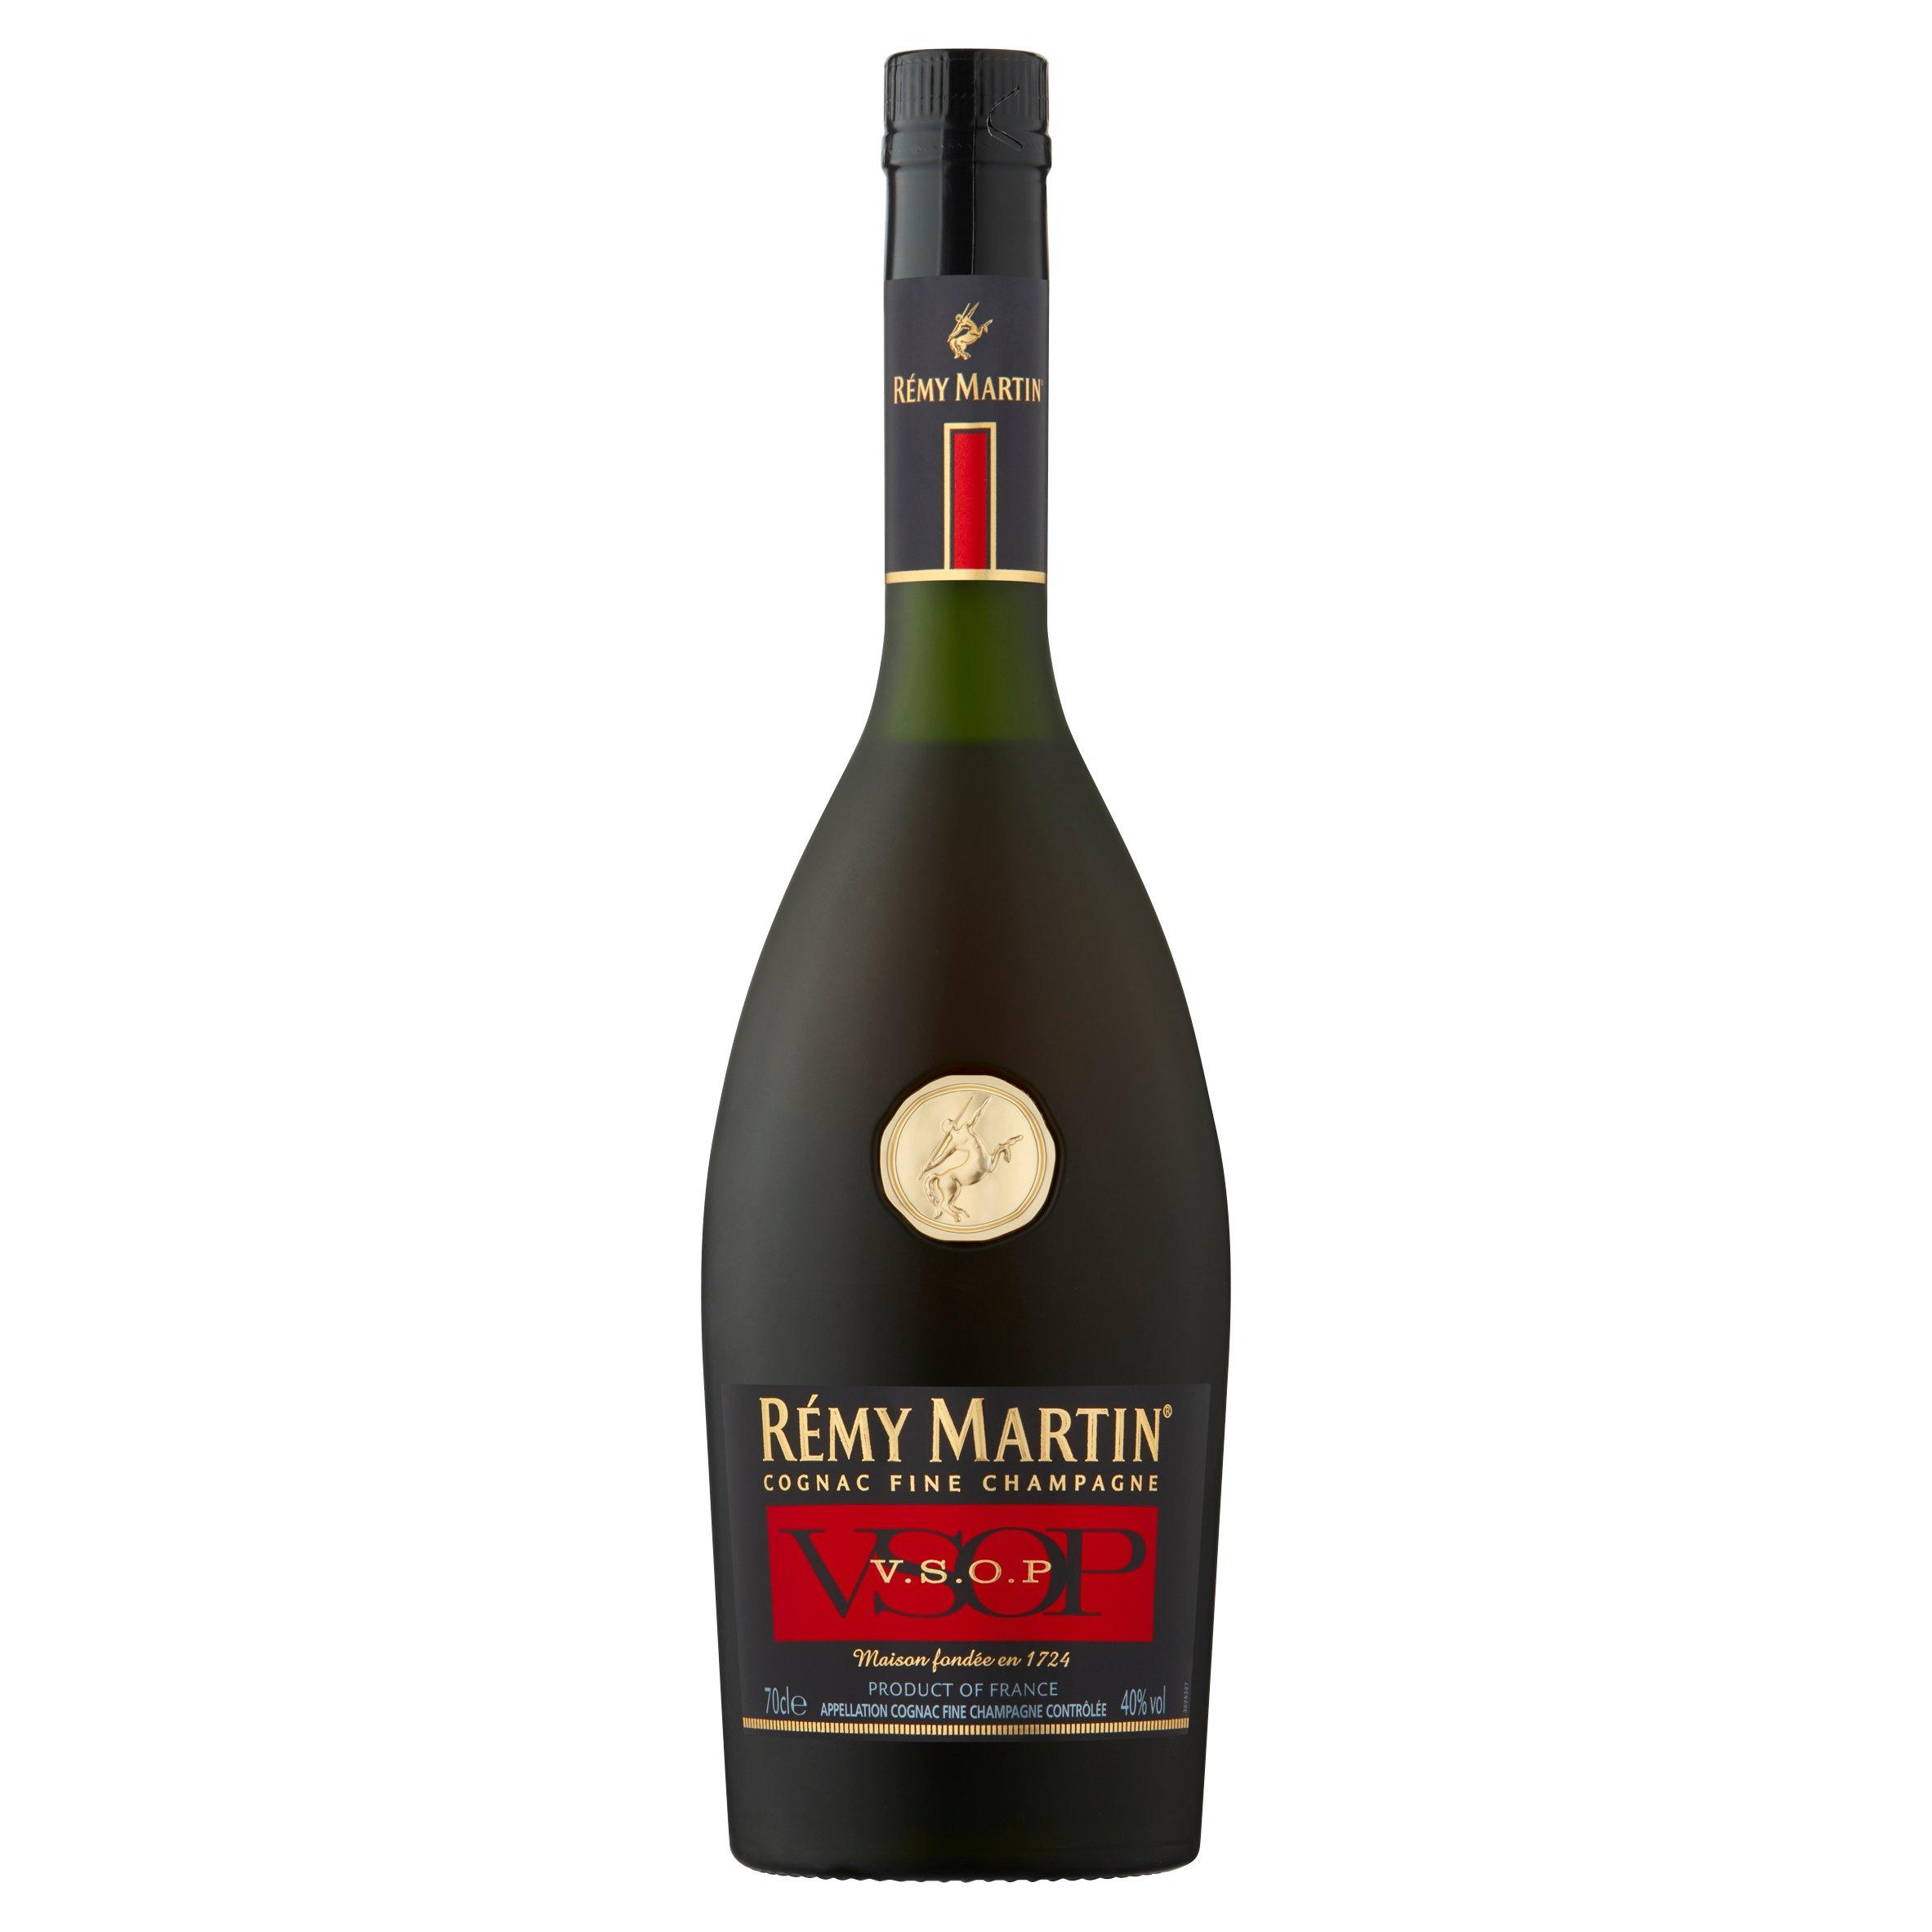 Remy Martin V.S.O.P. Cognac 70Cl Bottle